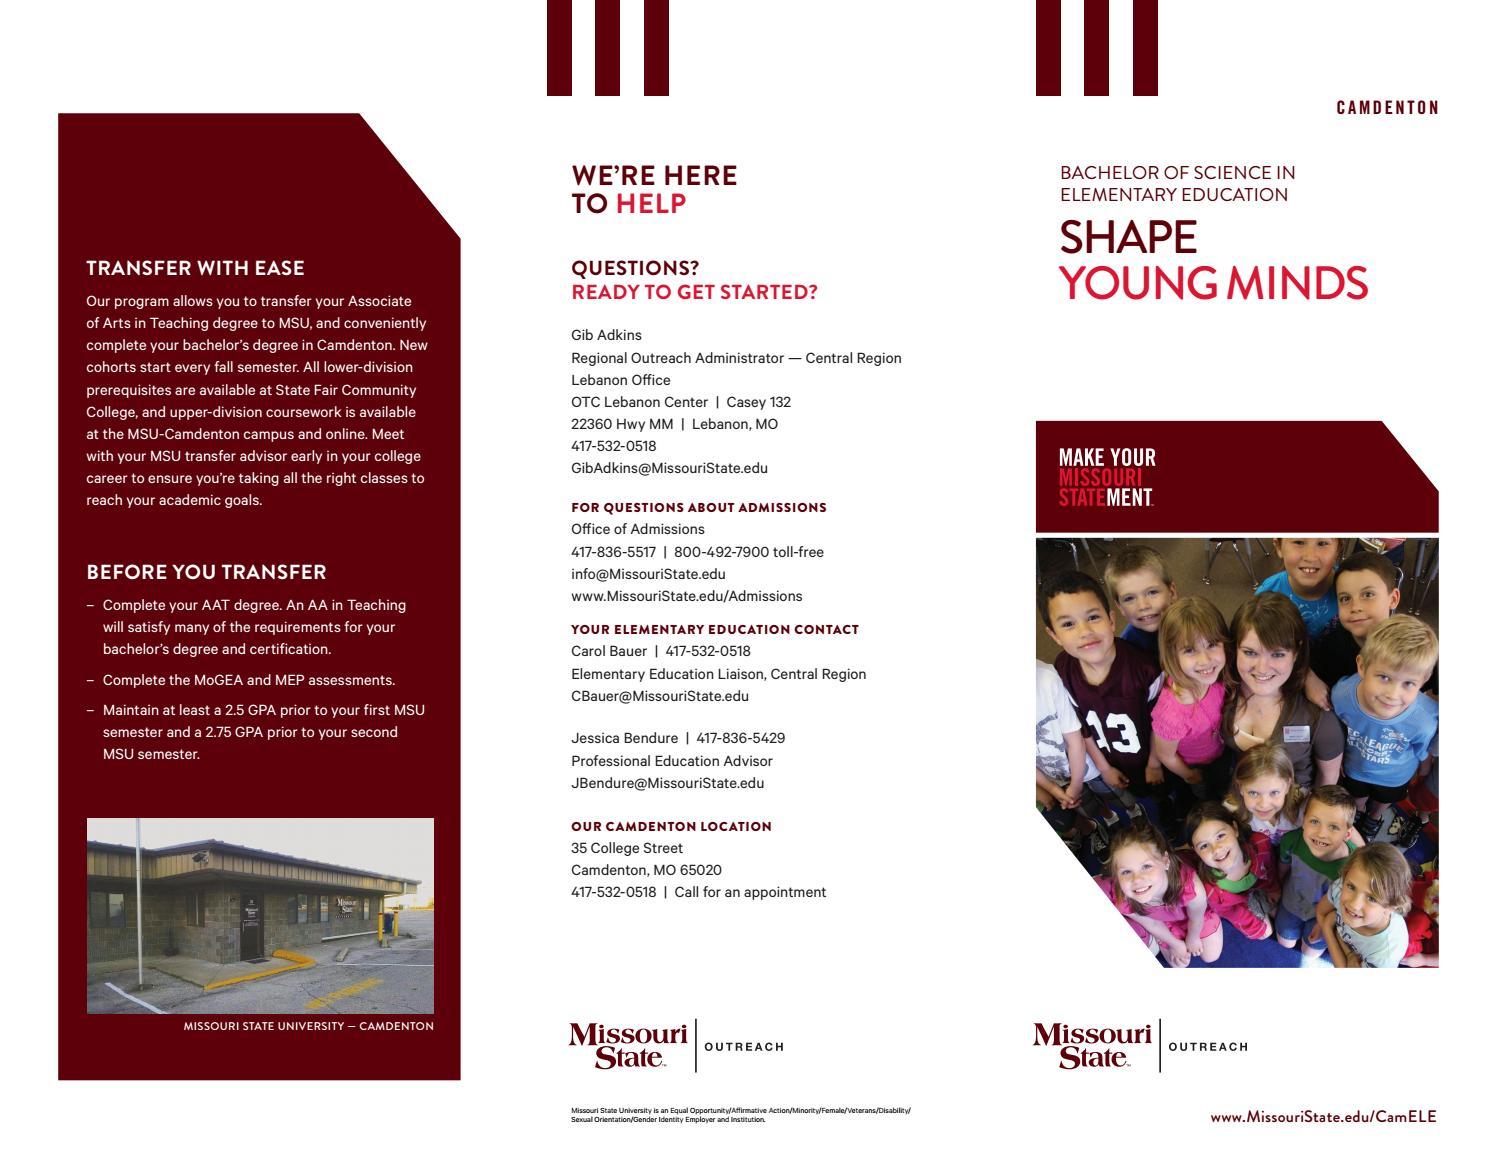 Ucm 2016 Undergraduate Catalog By University Of Central Missouri Issuu